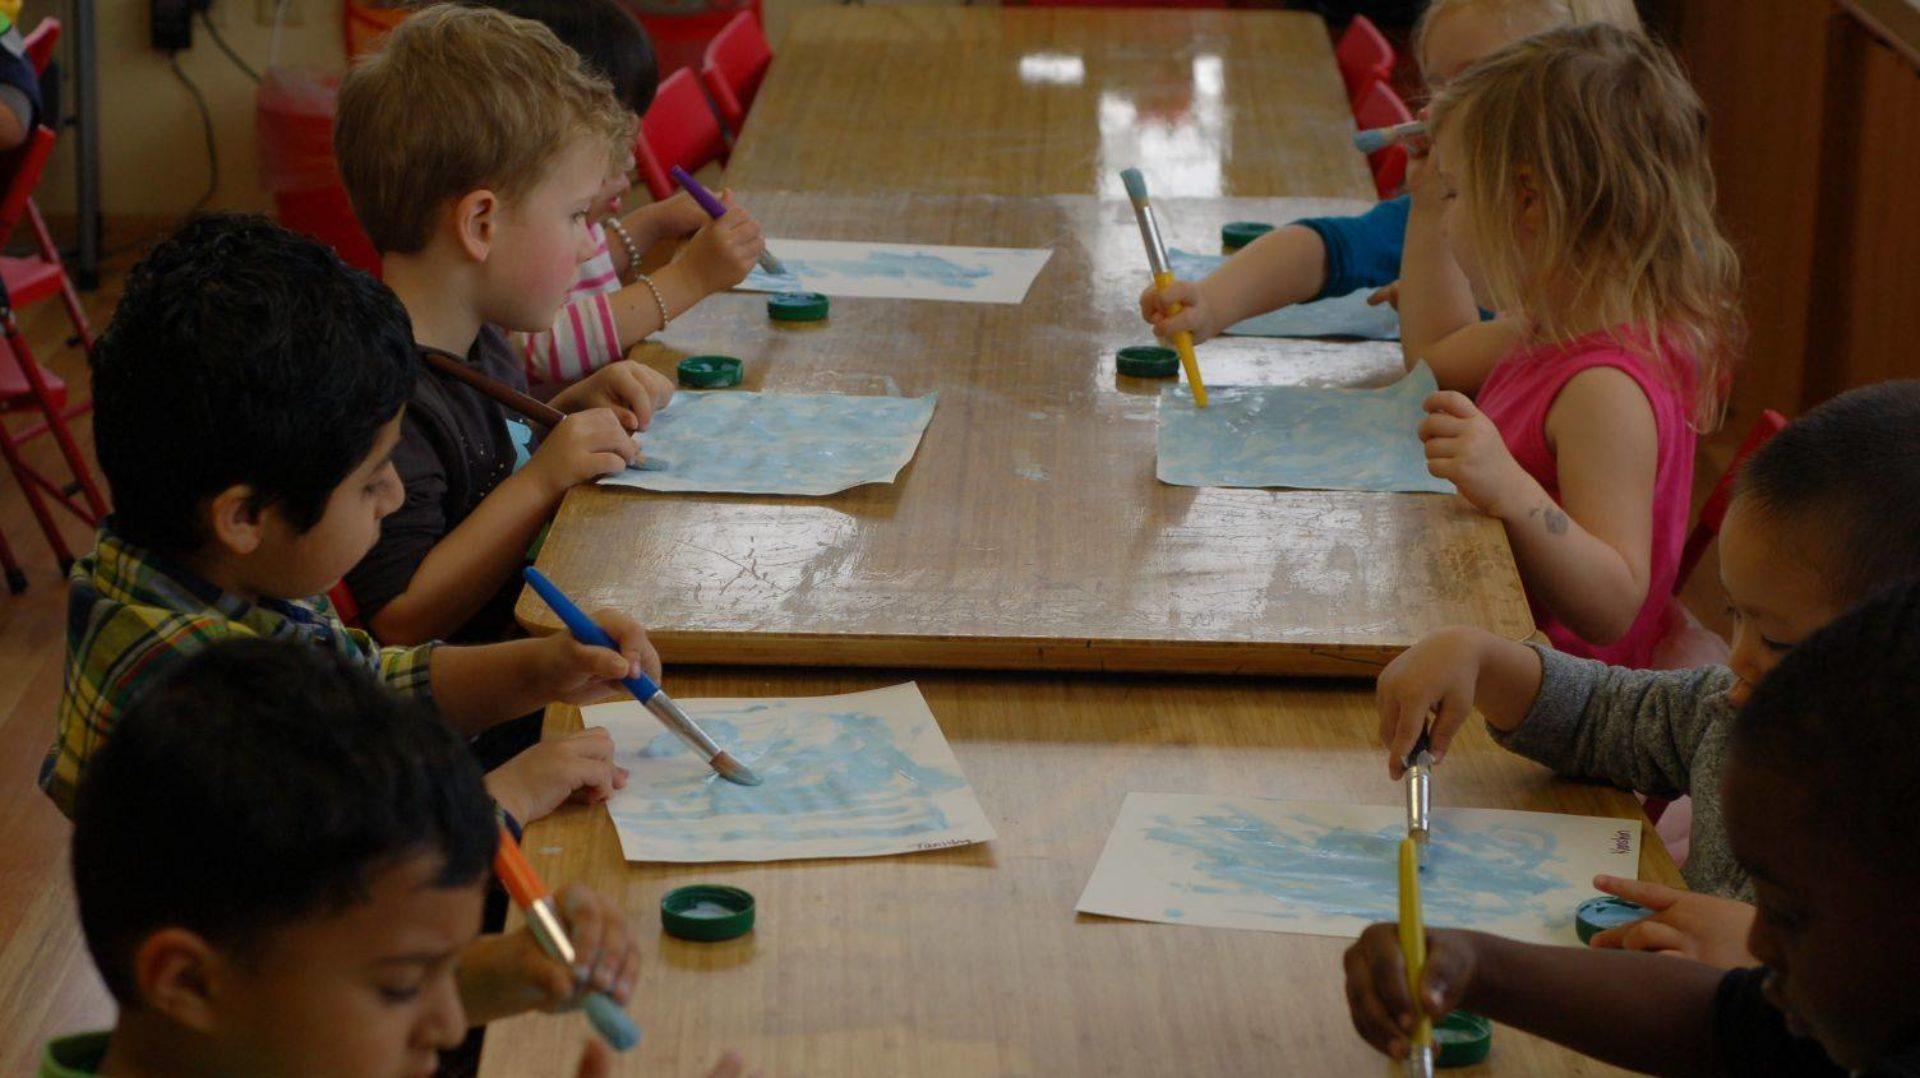 Basic Steps Learning Center Kent, WA